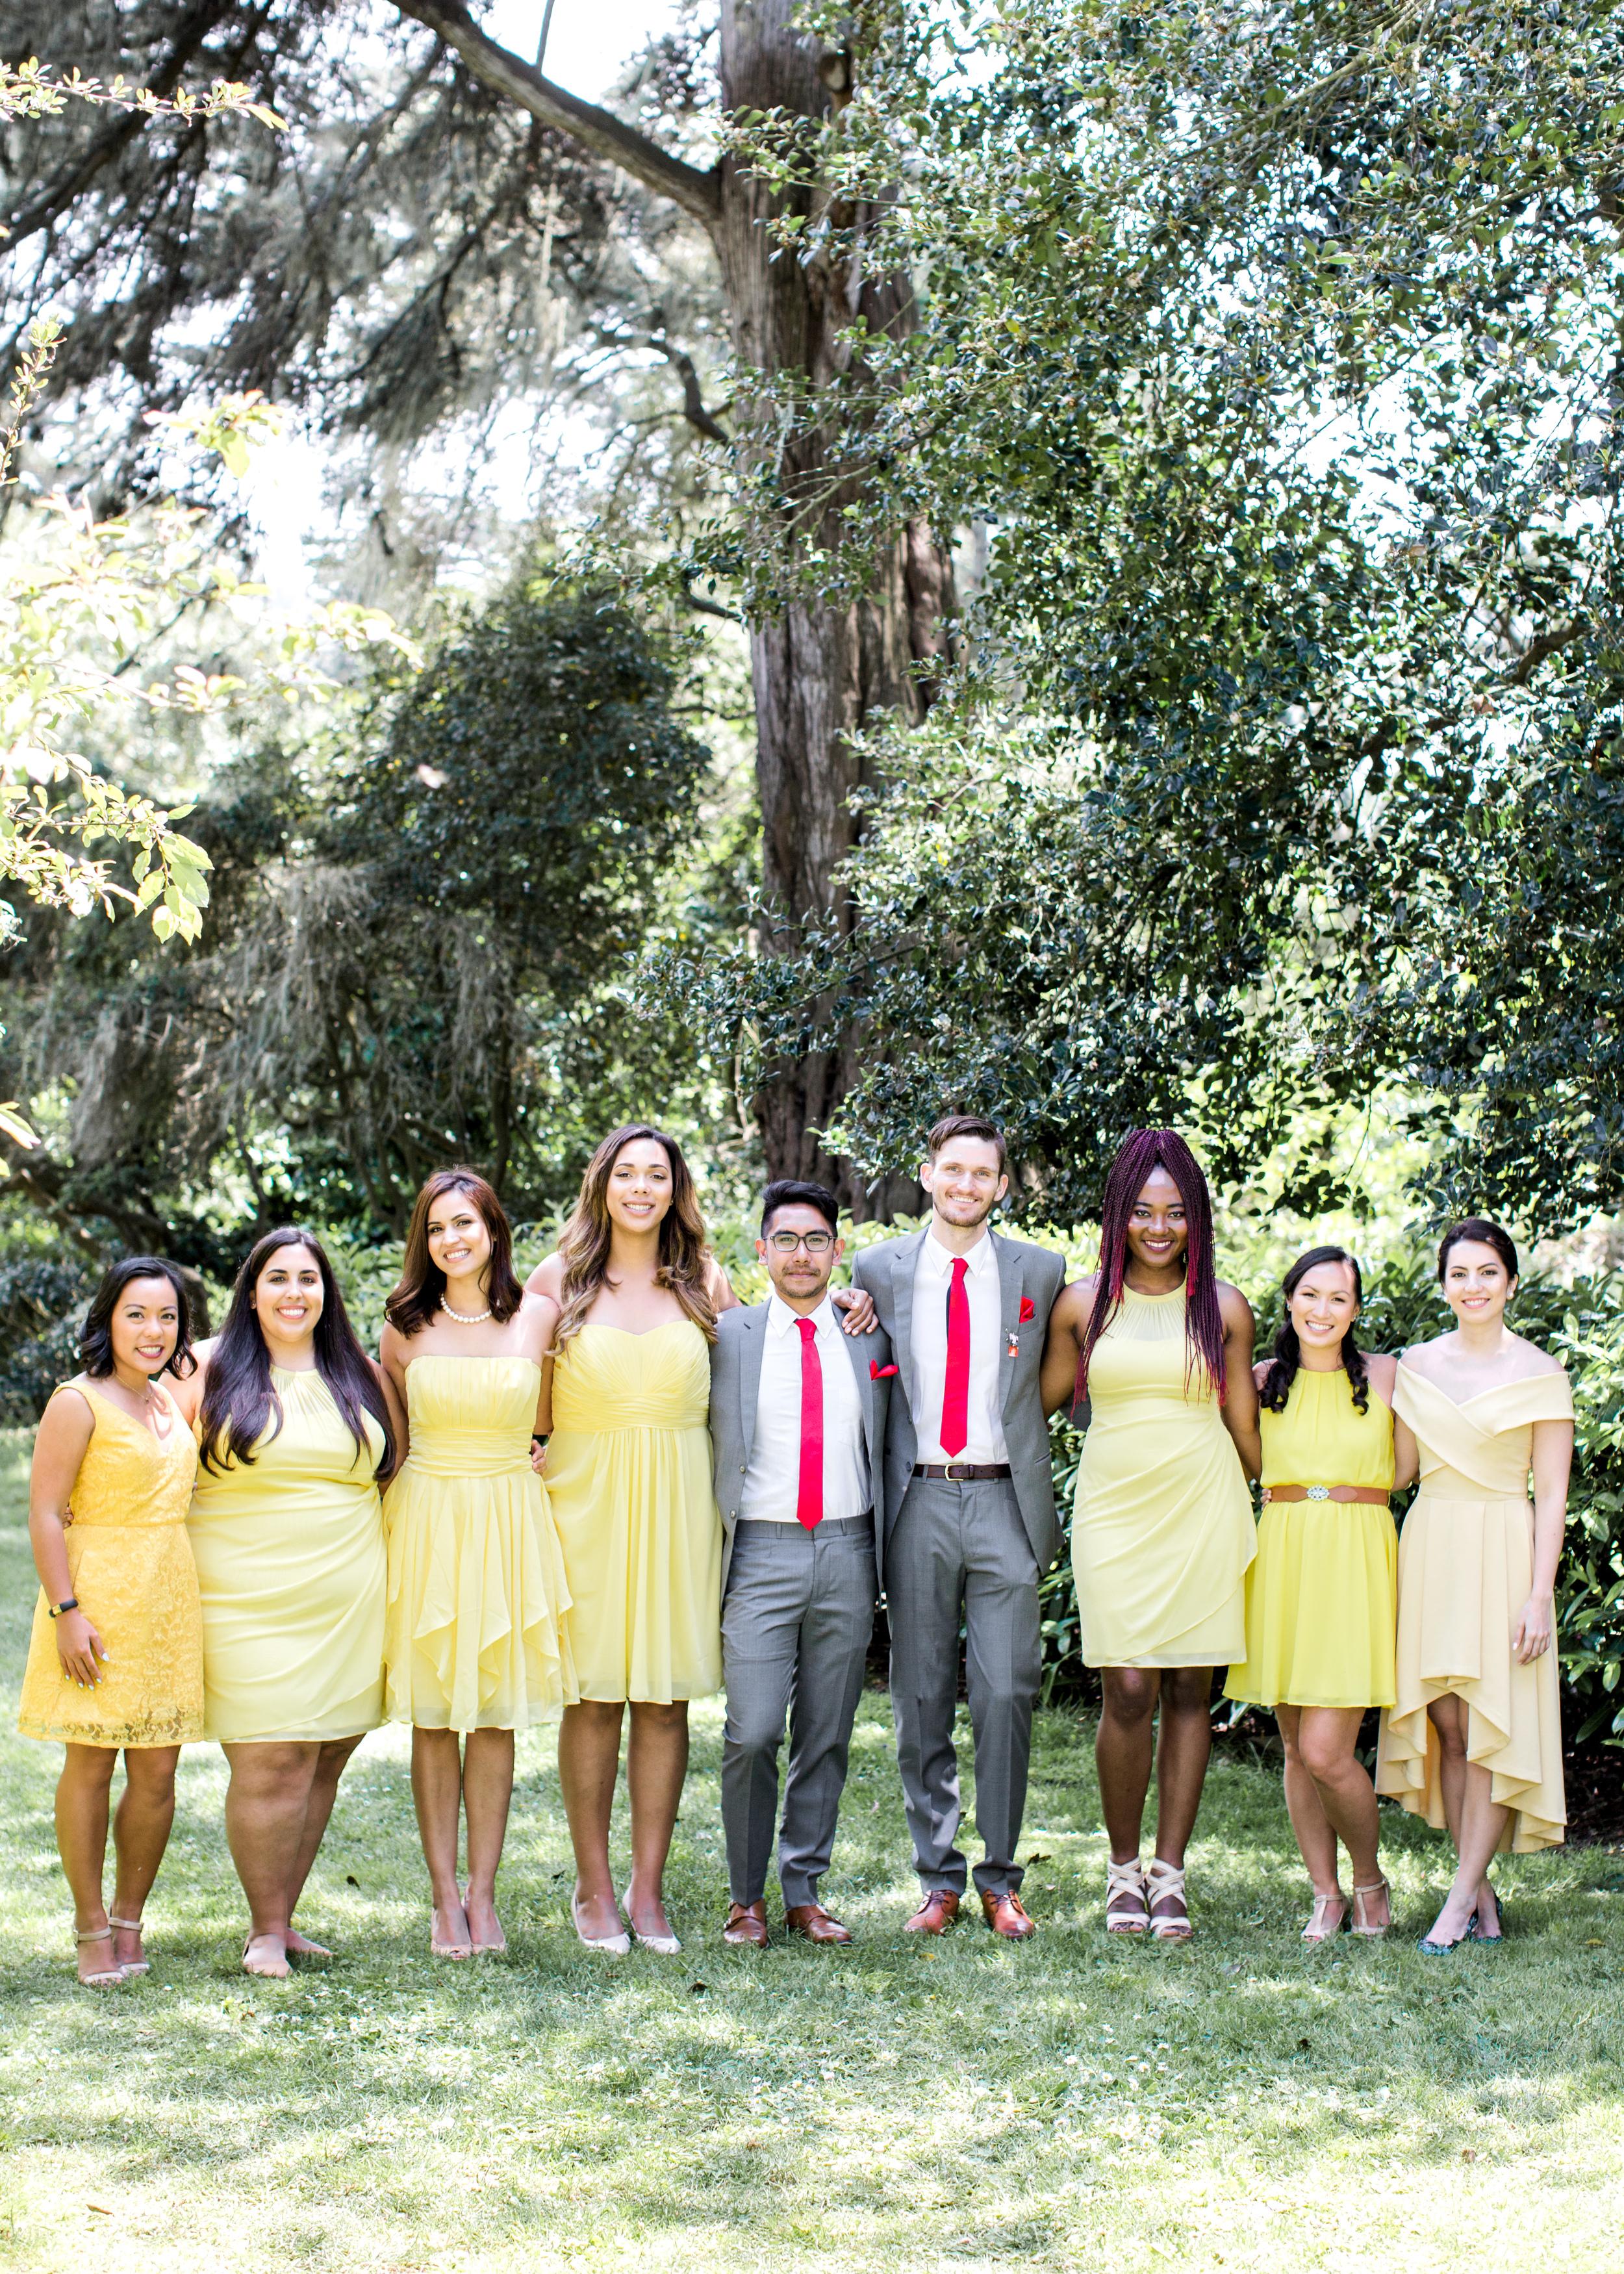 shakespeare-garden-golden-gate-park-san-francisco-wedding-photography-20.jpg